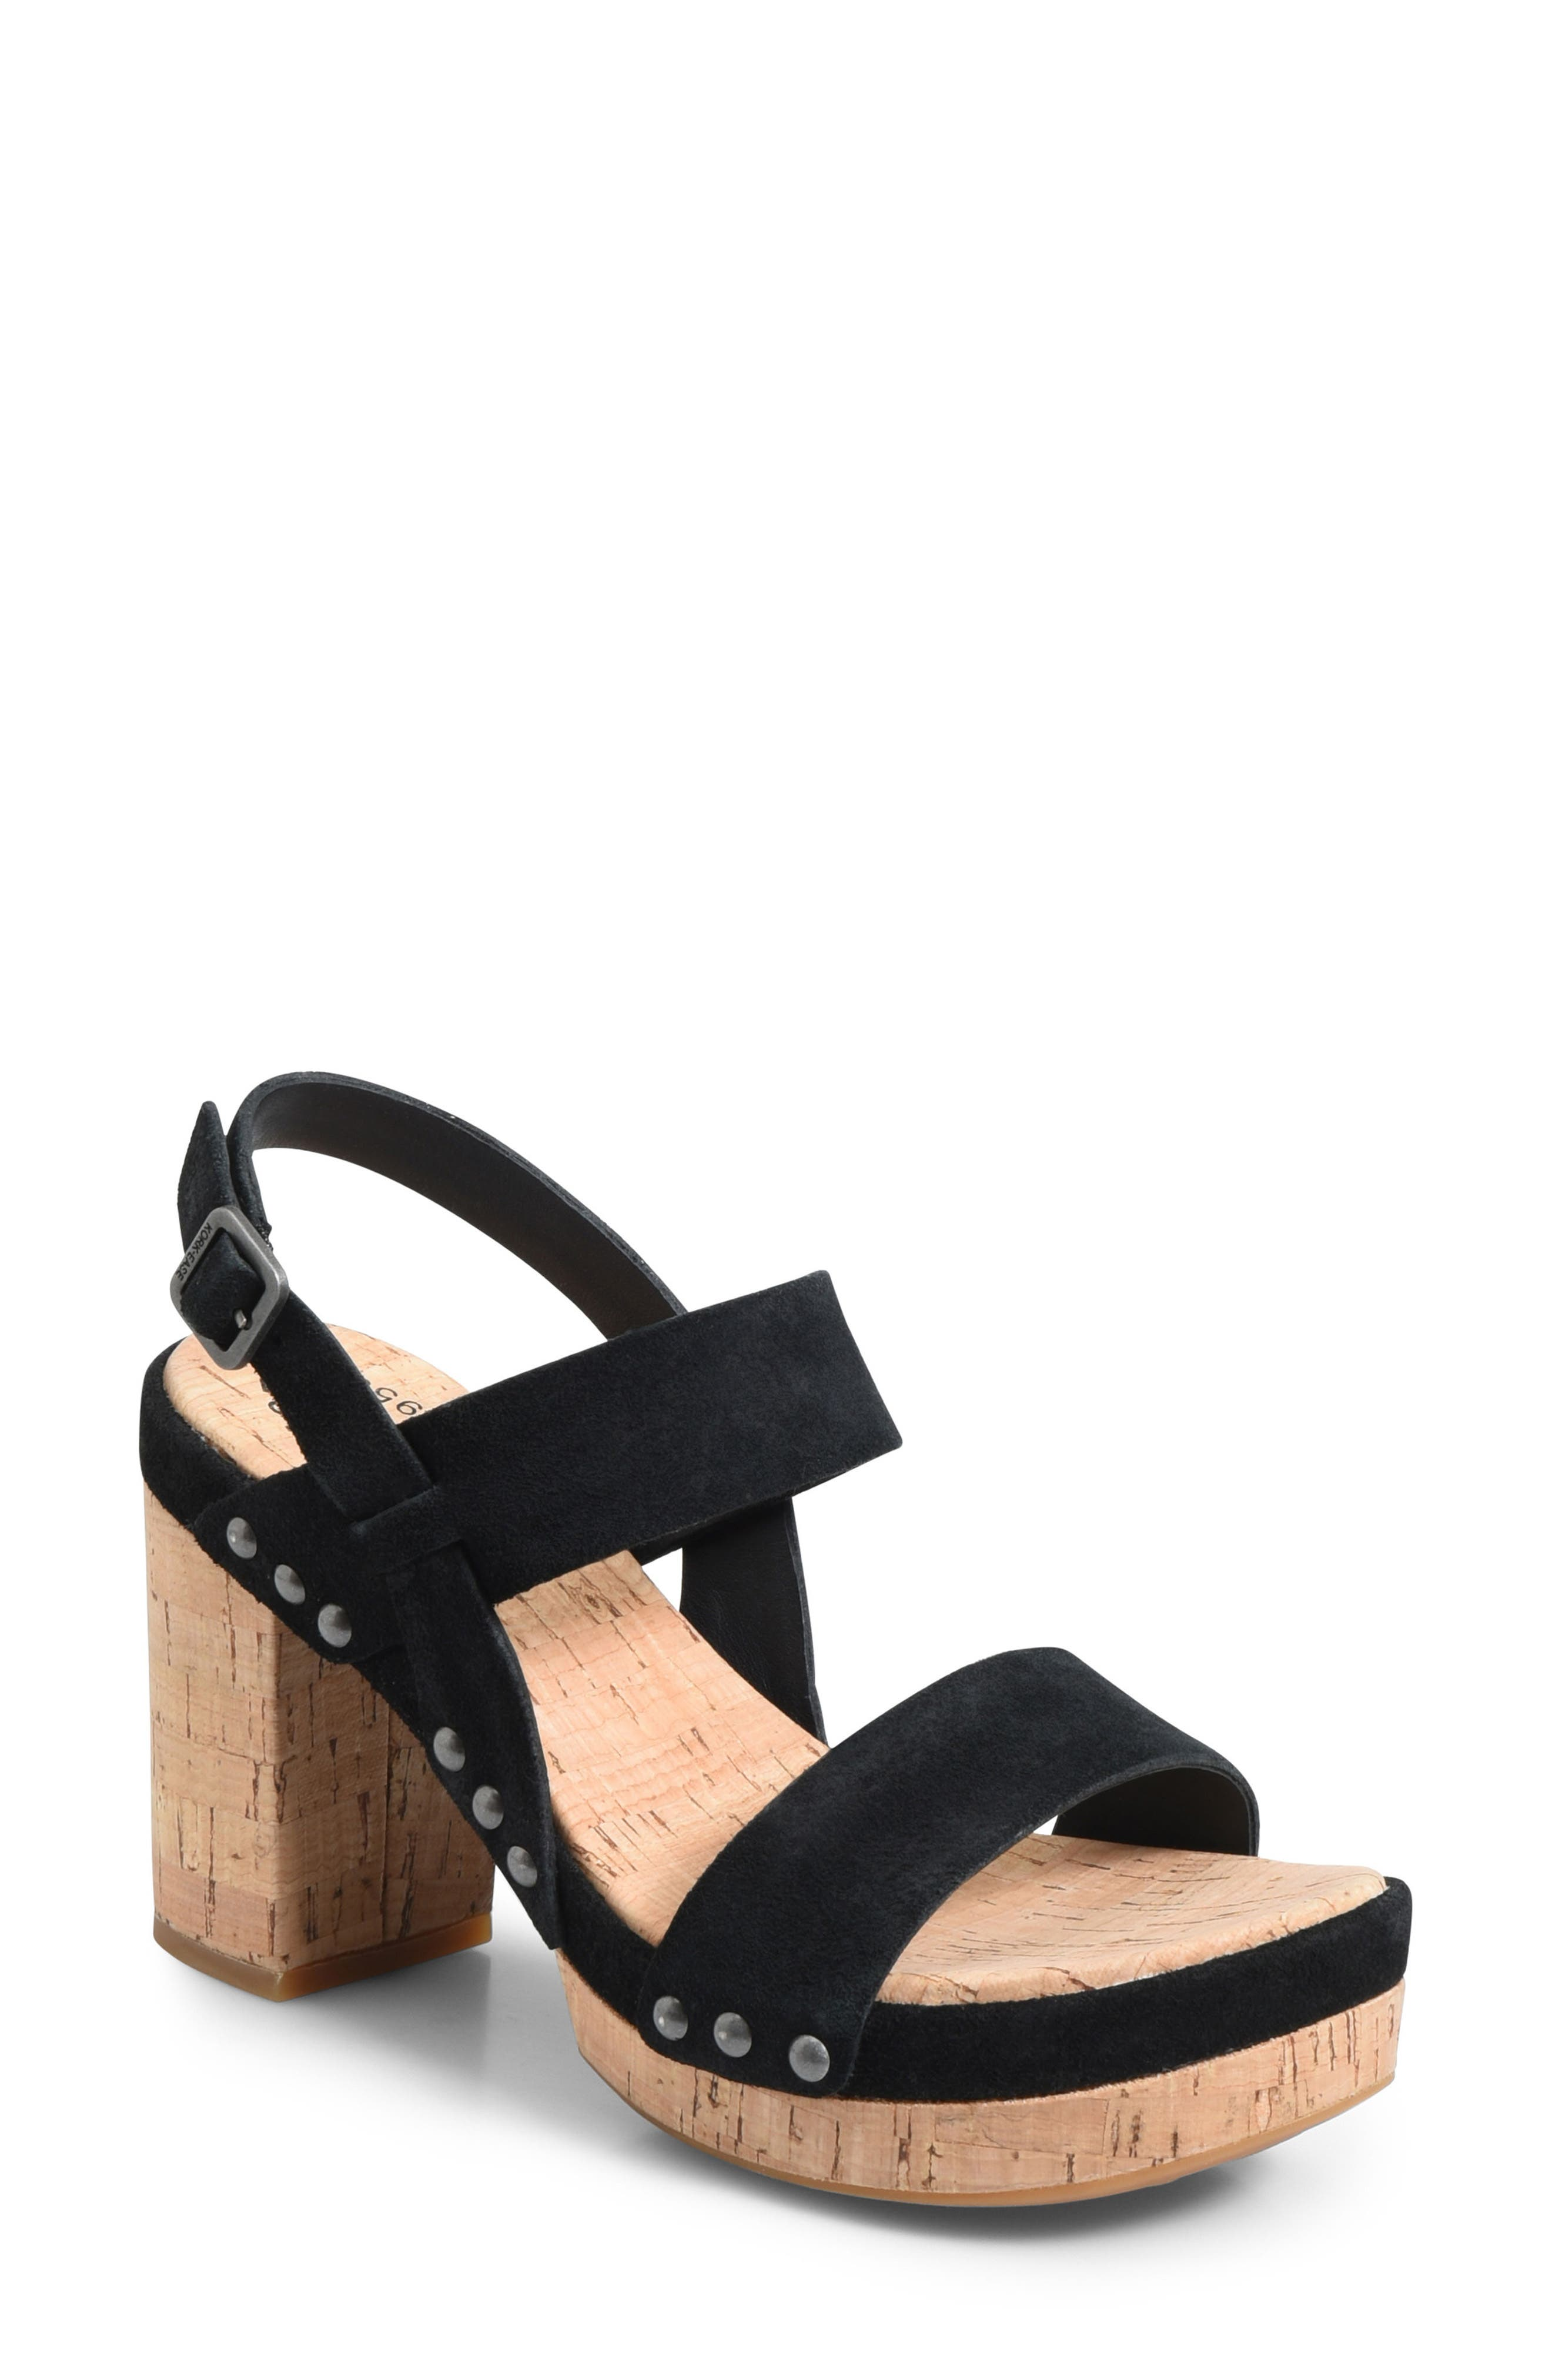 Palmdale Platform Sandal,                         Main,                         color, Black Suede